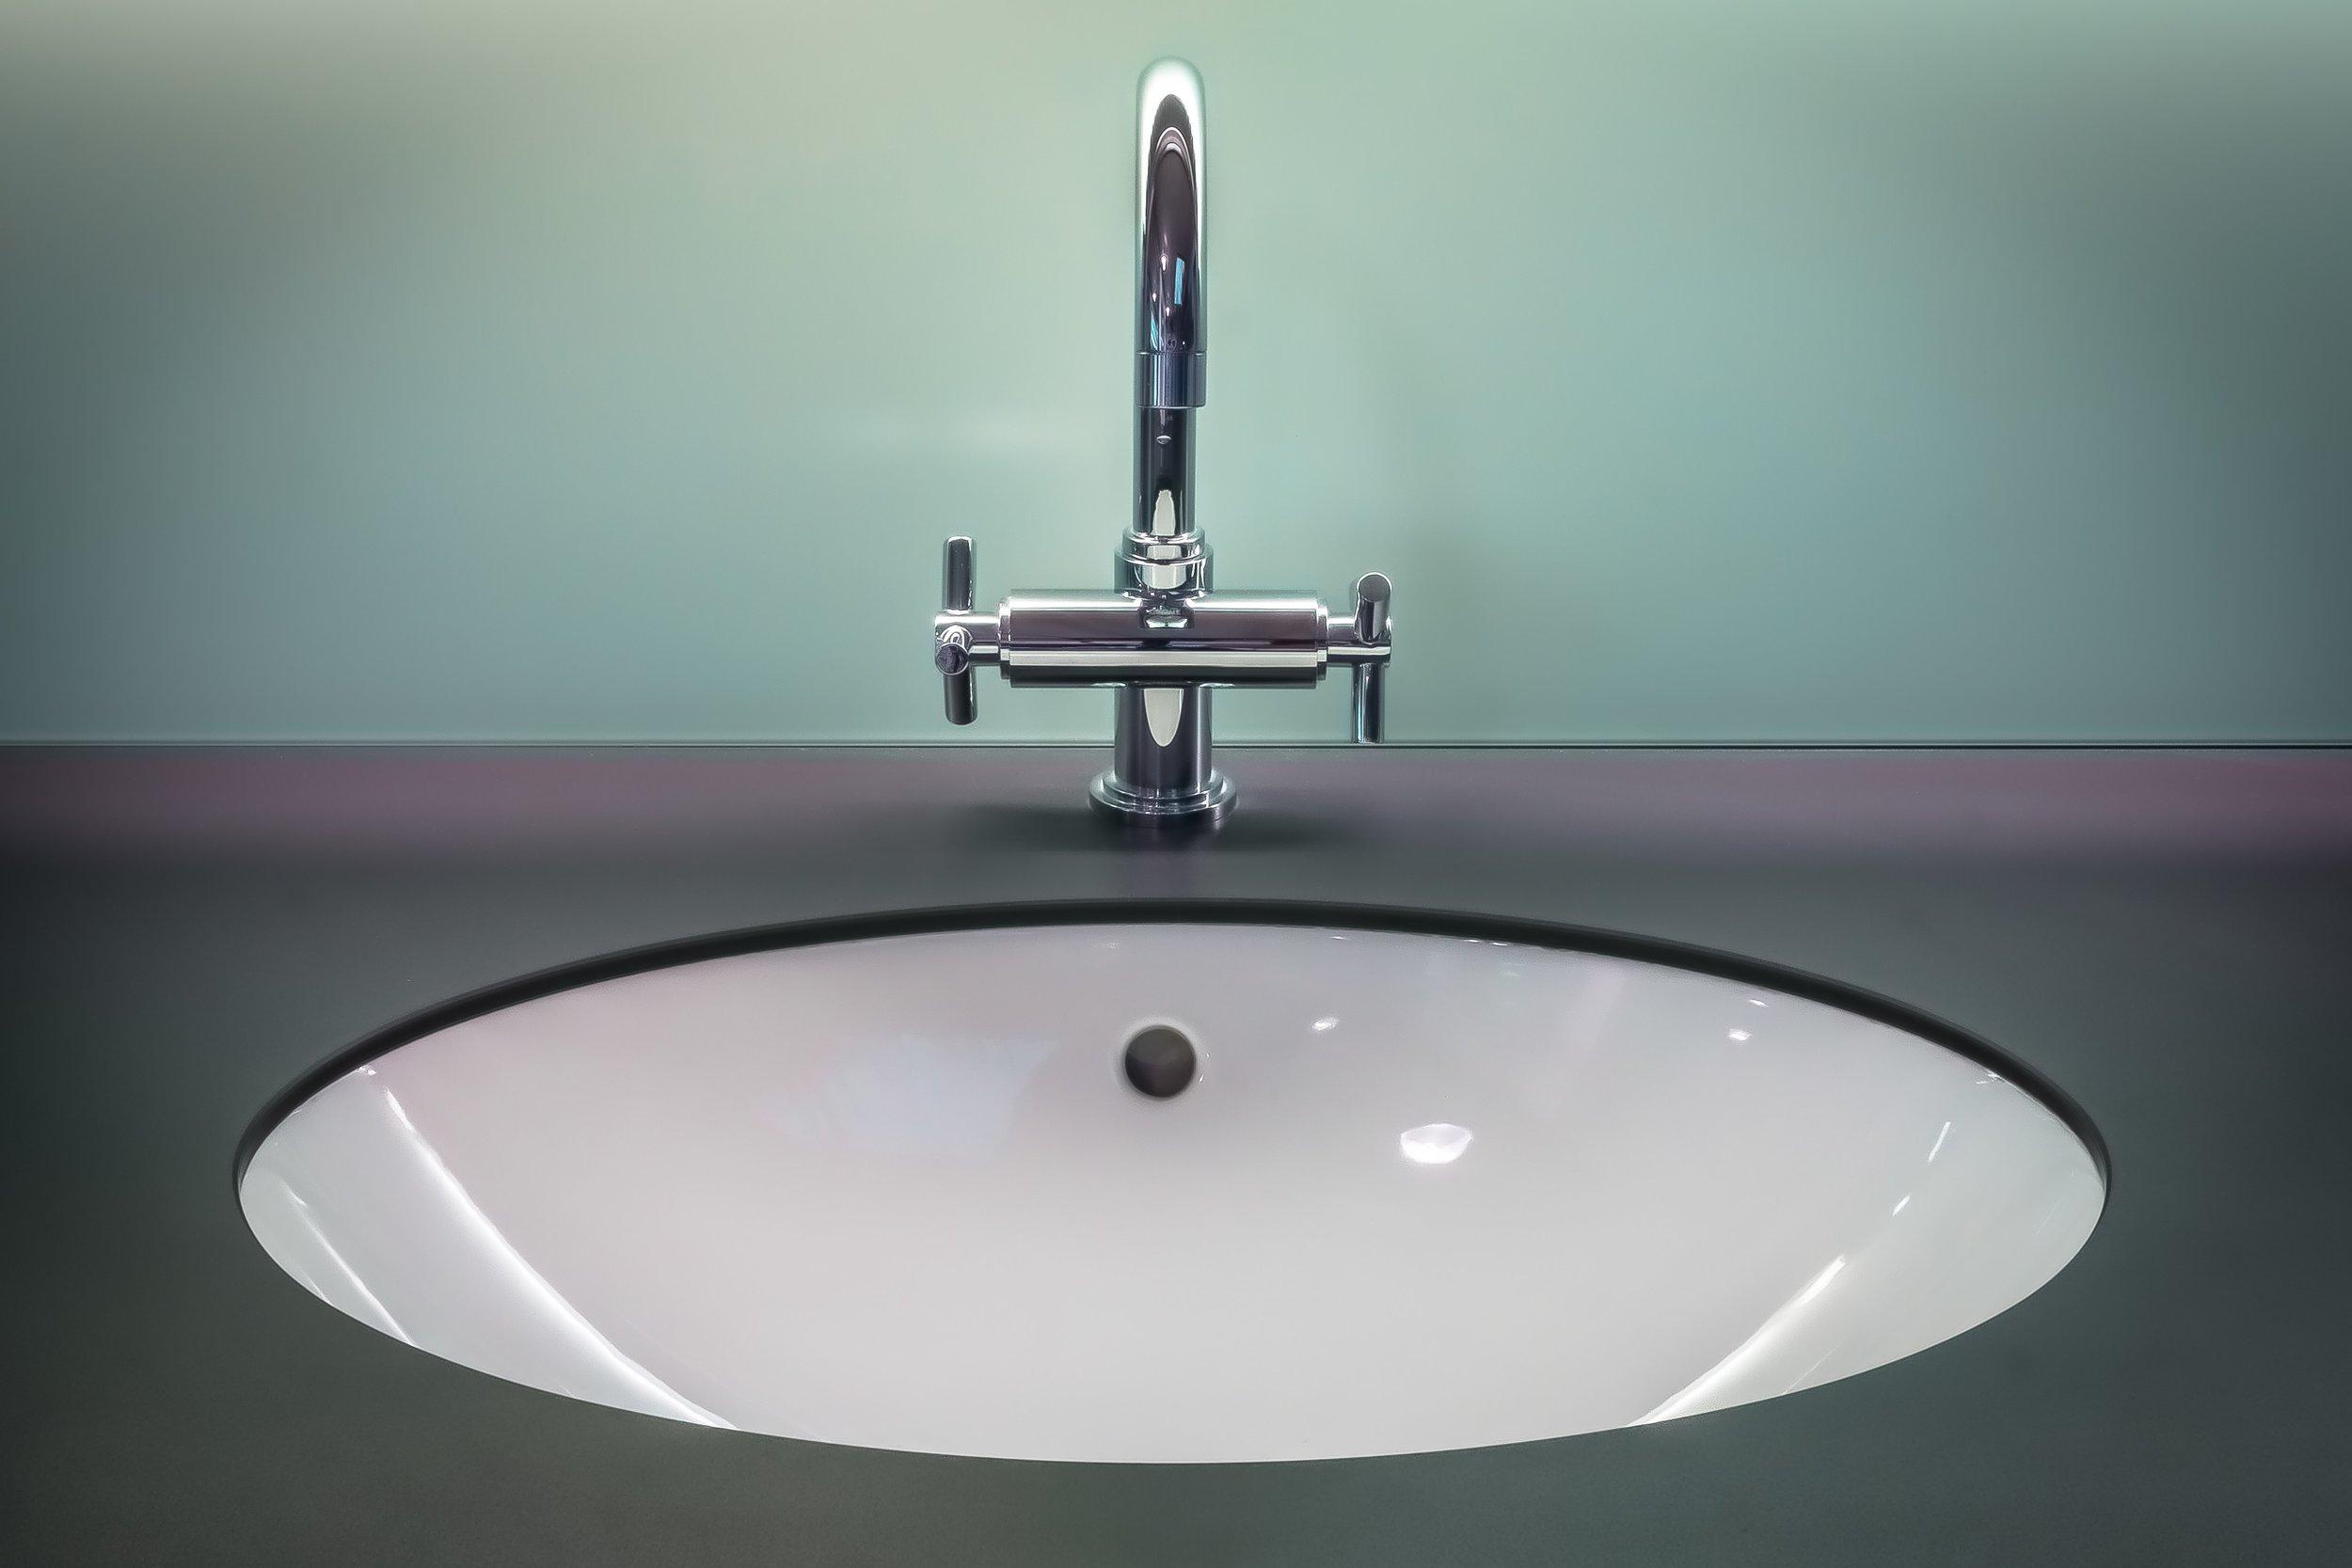 bathroom-clean-faucet-145512.jpg